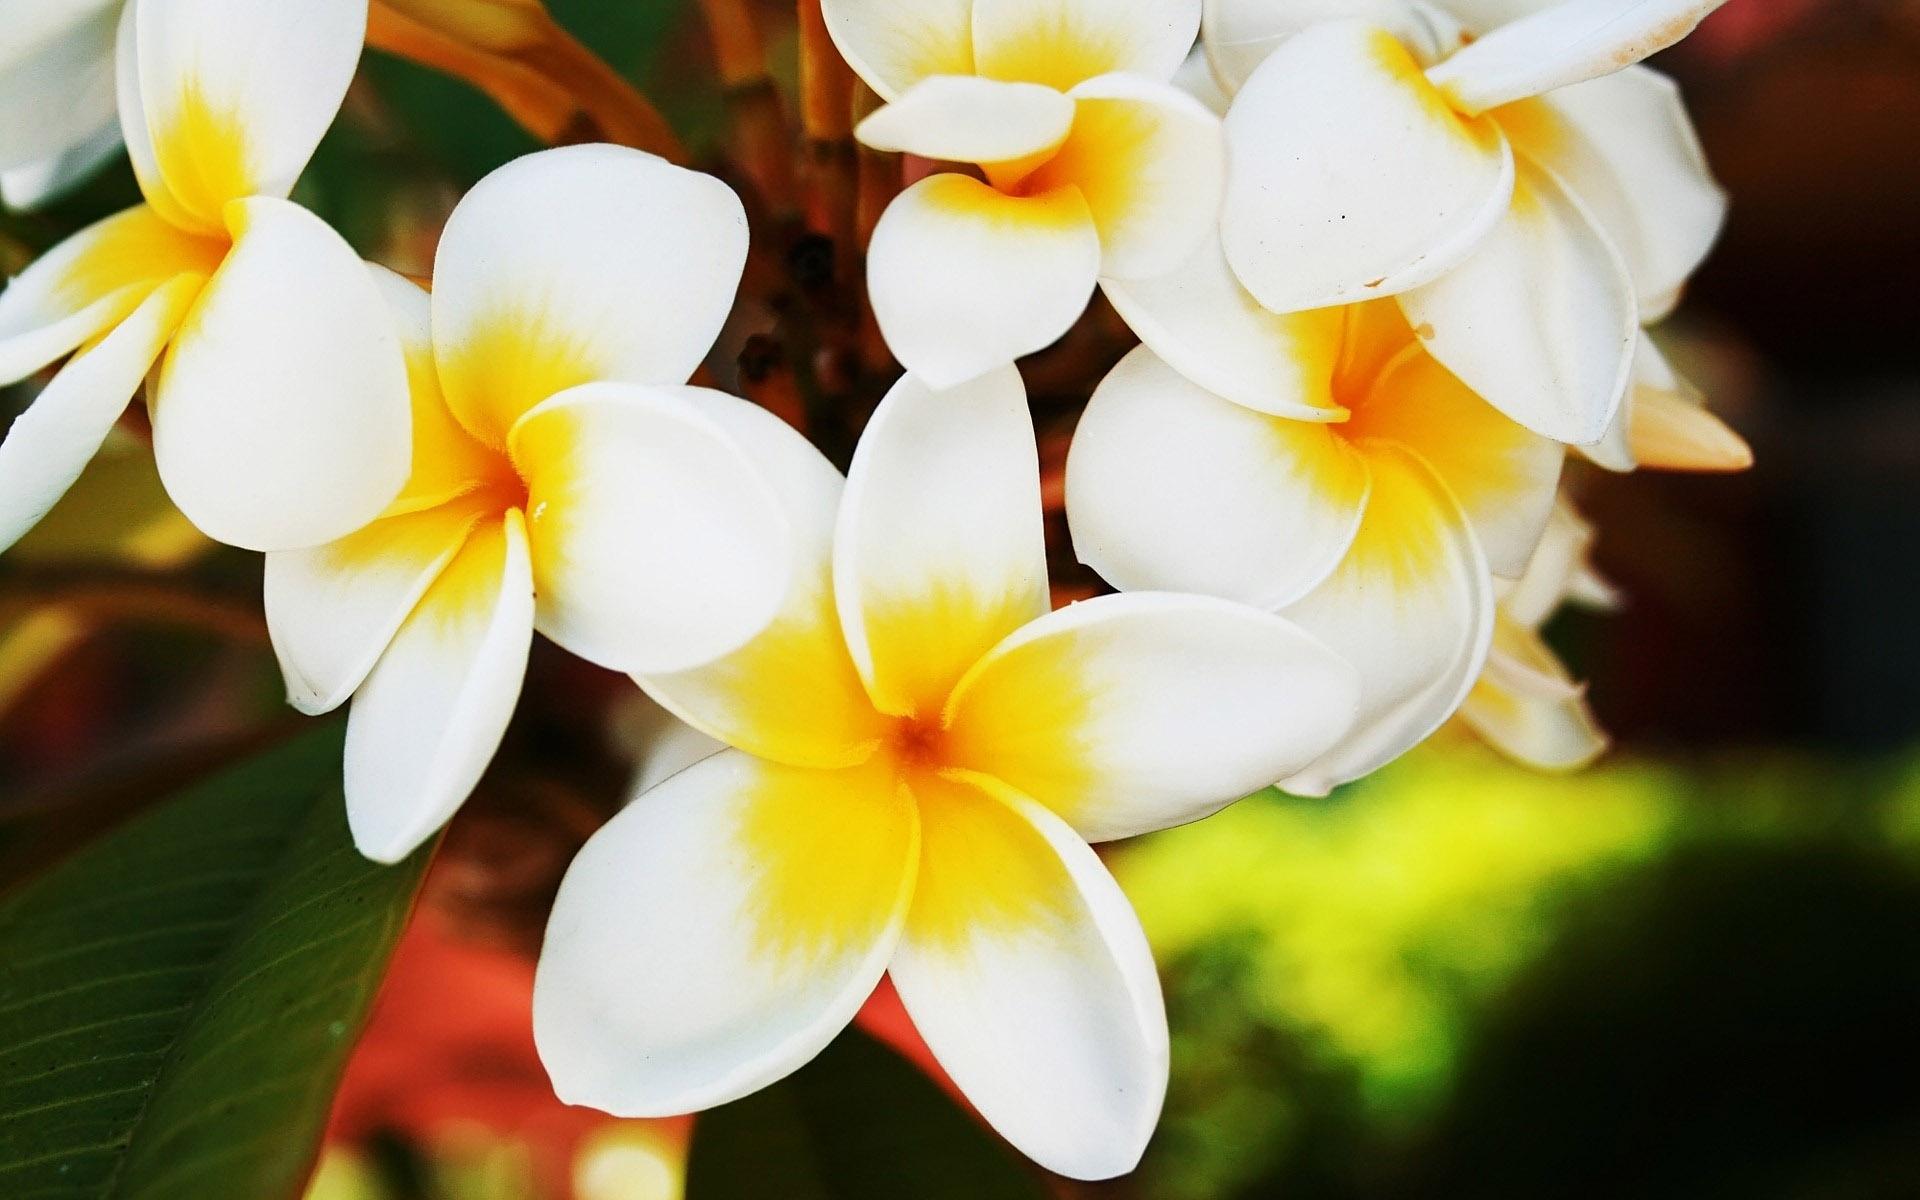 Nature Flowers Photos